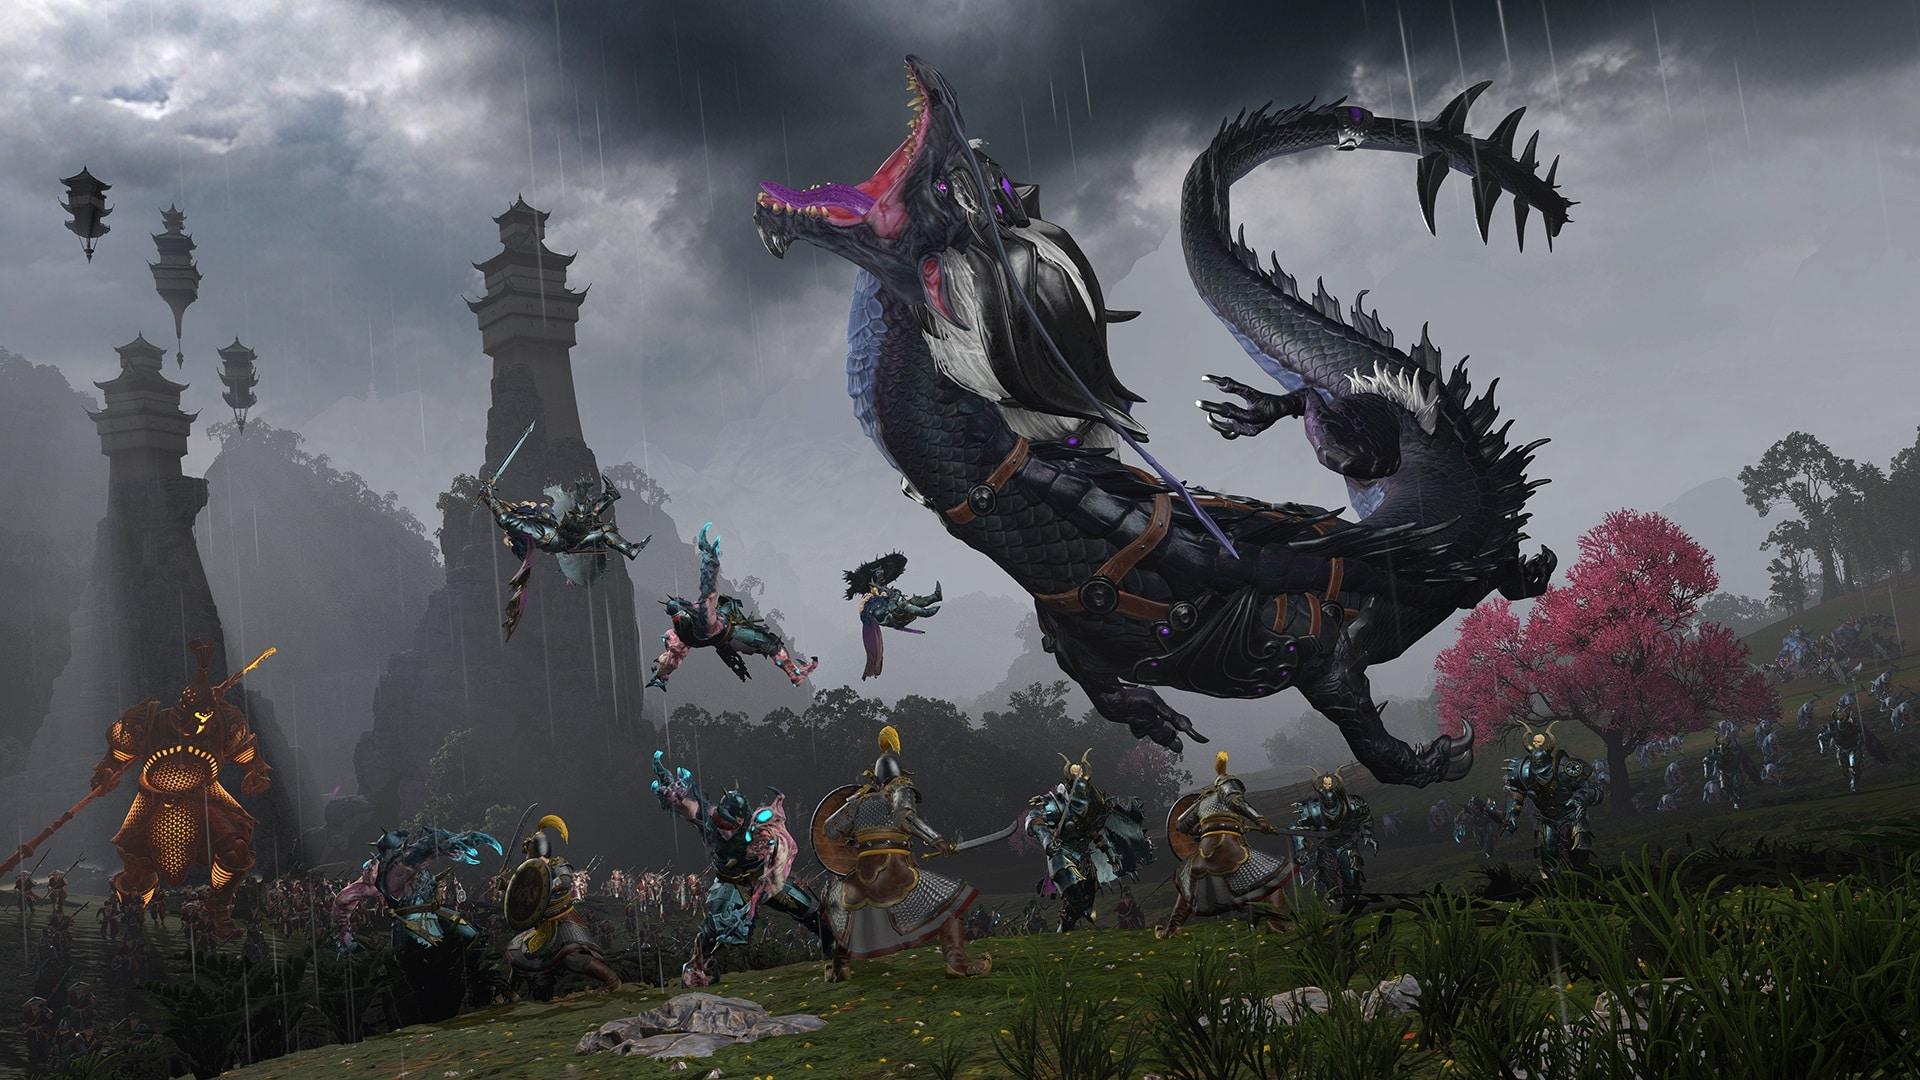 Miao Ying die Sturmdrachin in Drachenform wie sie Chaoskrieger zerfetzt